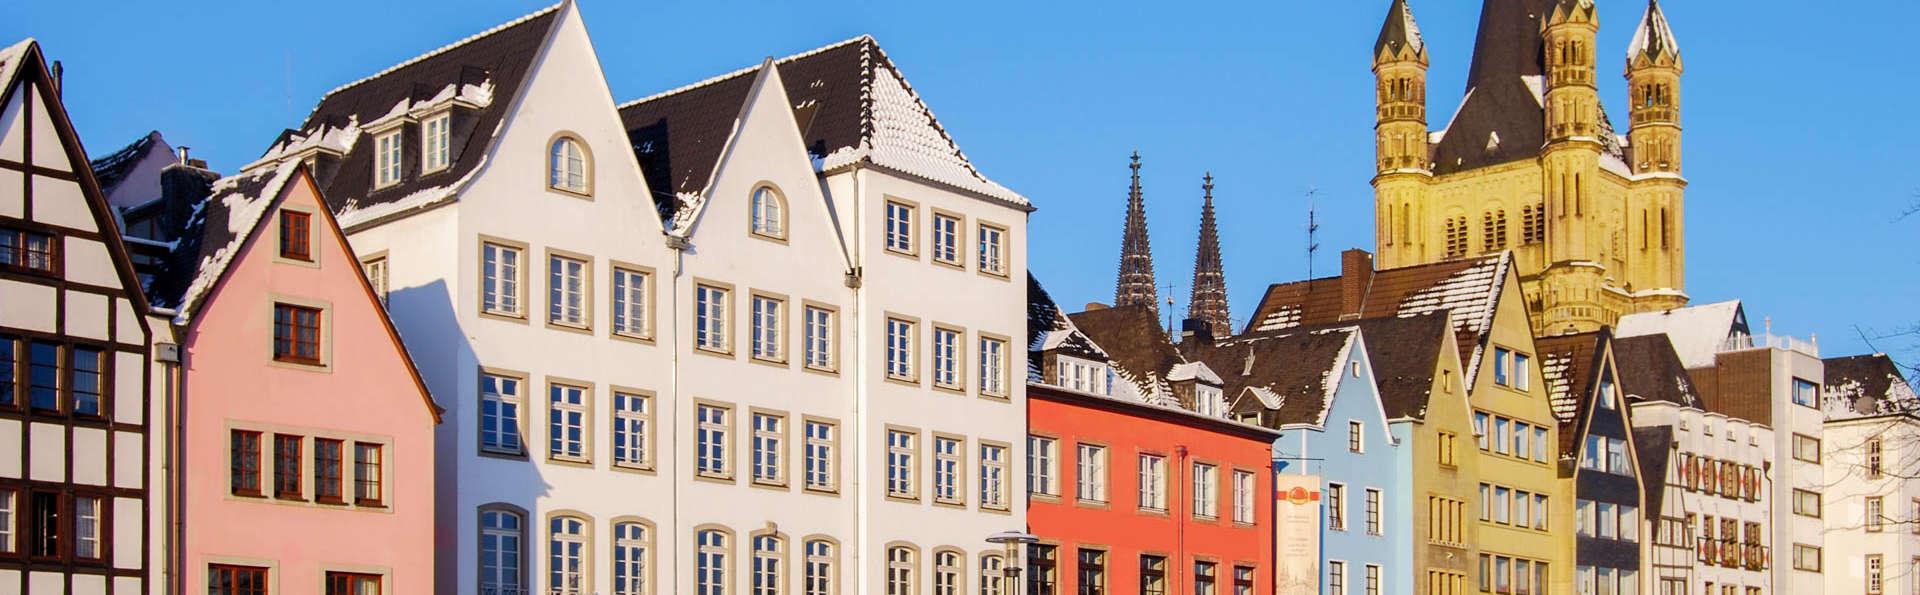 Lindner Hotel Dom Residence - EDIT_DESTINATION_04.jpg